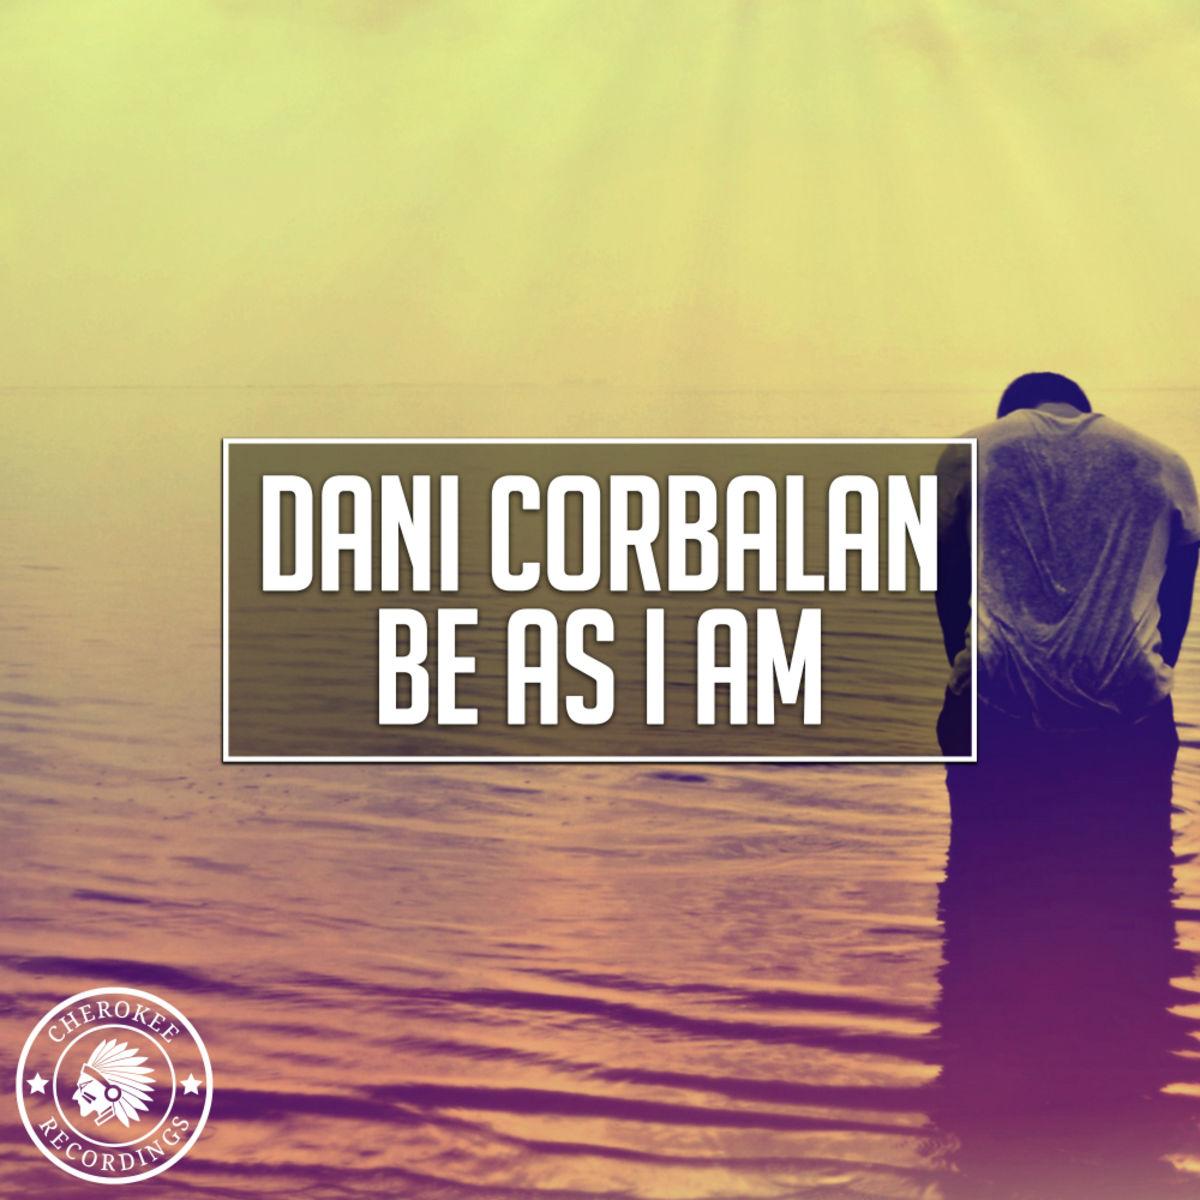 Dani Corbalan - Be As I Am  (Radio Edit)